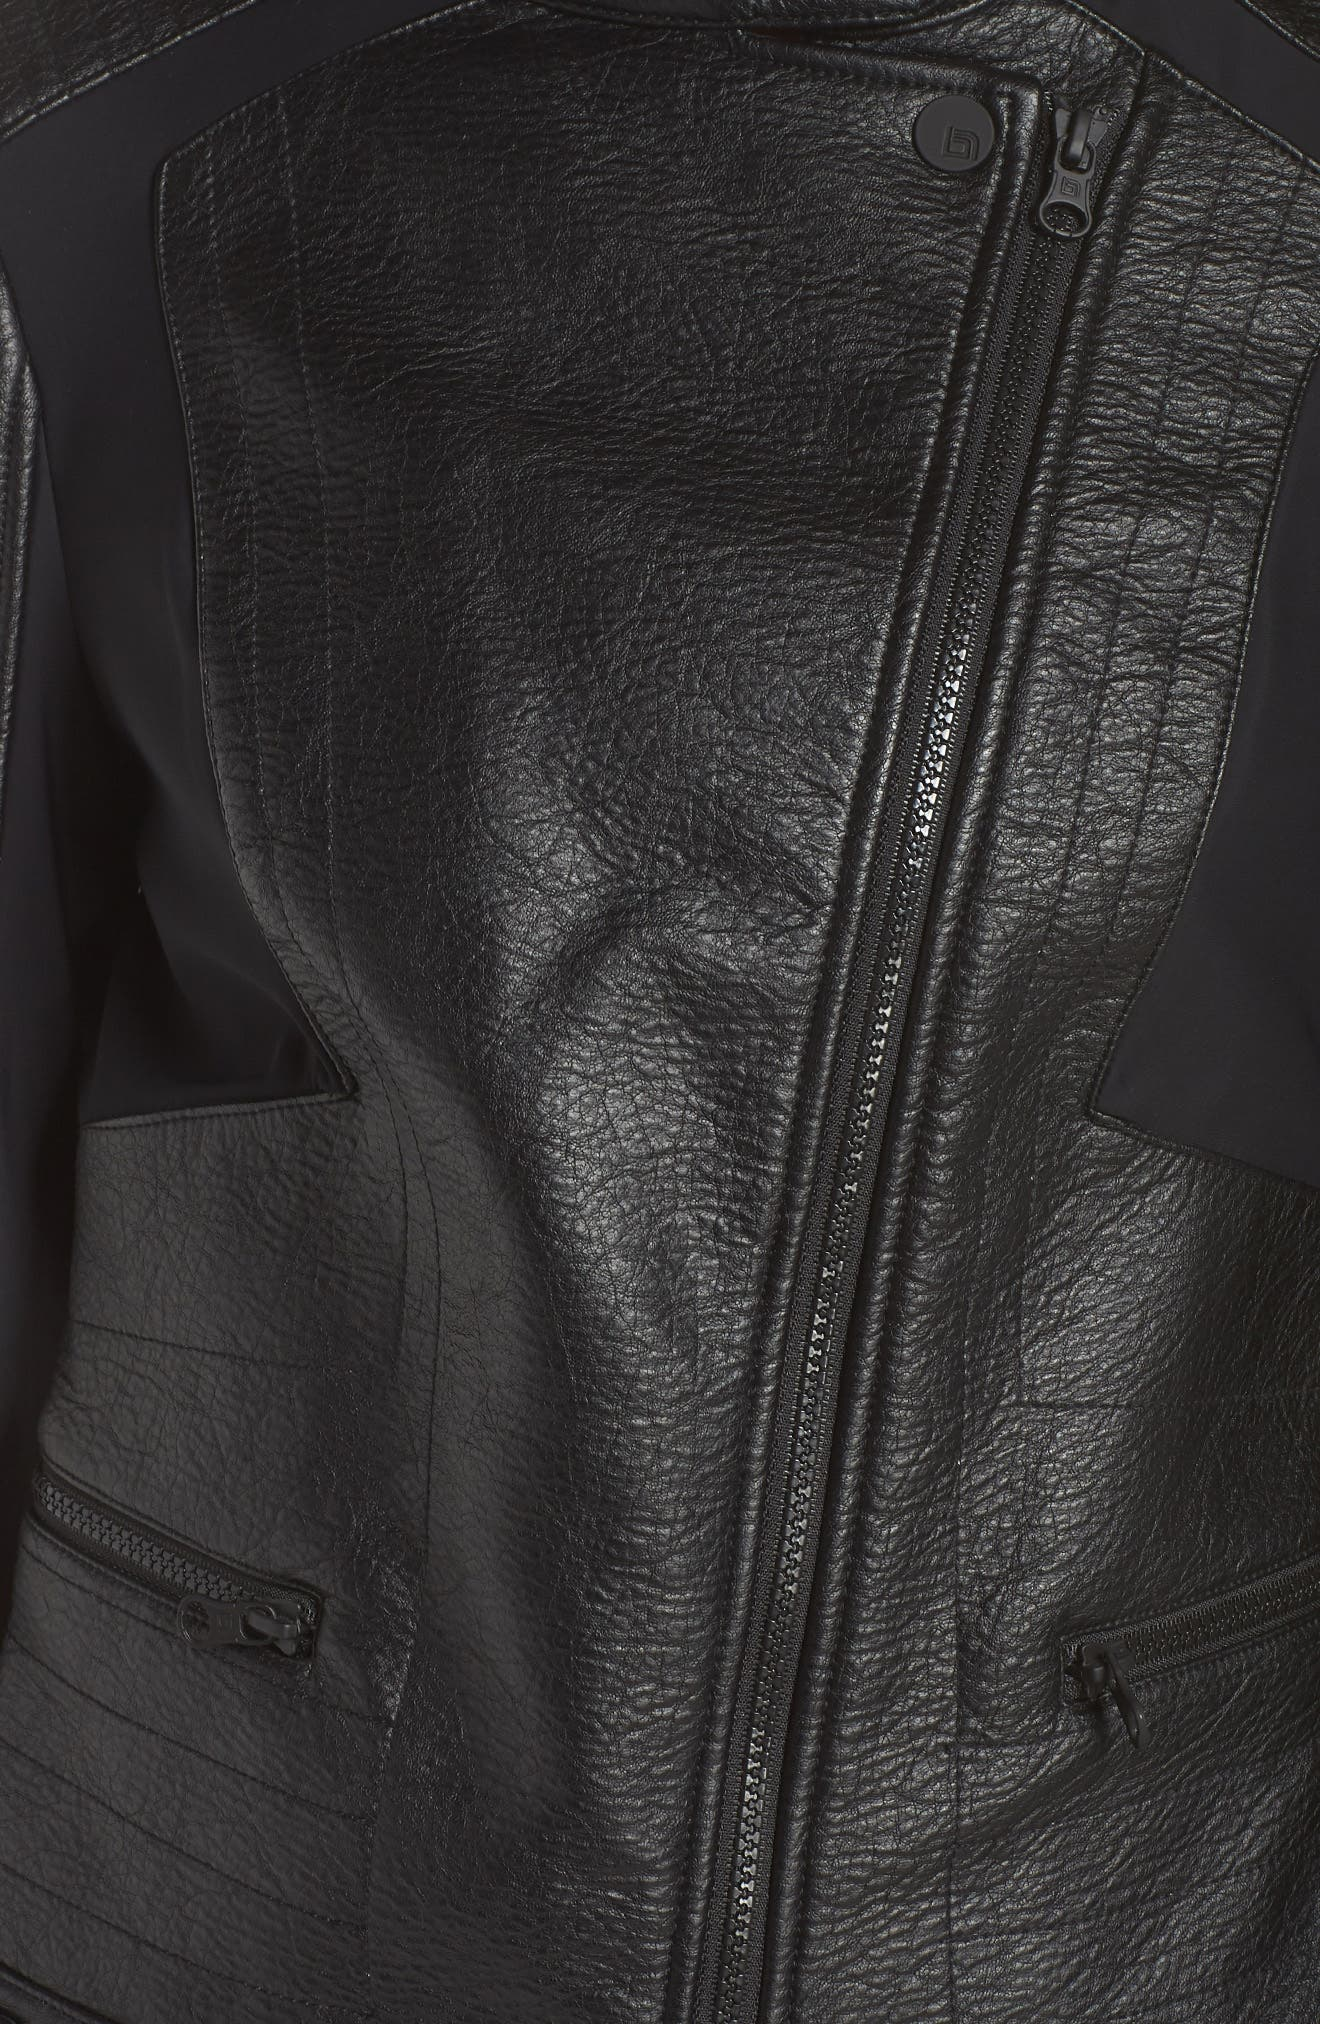 Ryder Faux Leather Moto Jacket,                             Alternate thumbnail 7, color,                             BLACK/ GREY